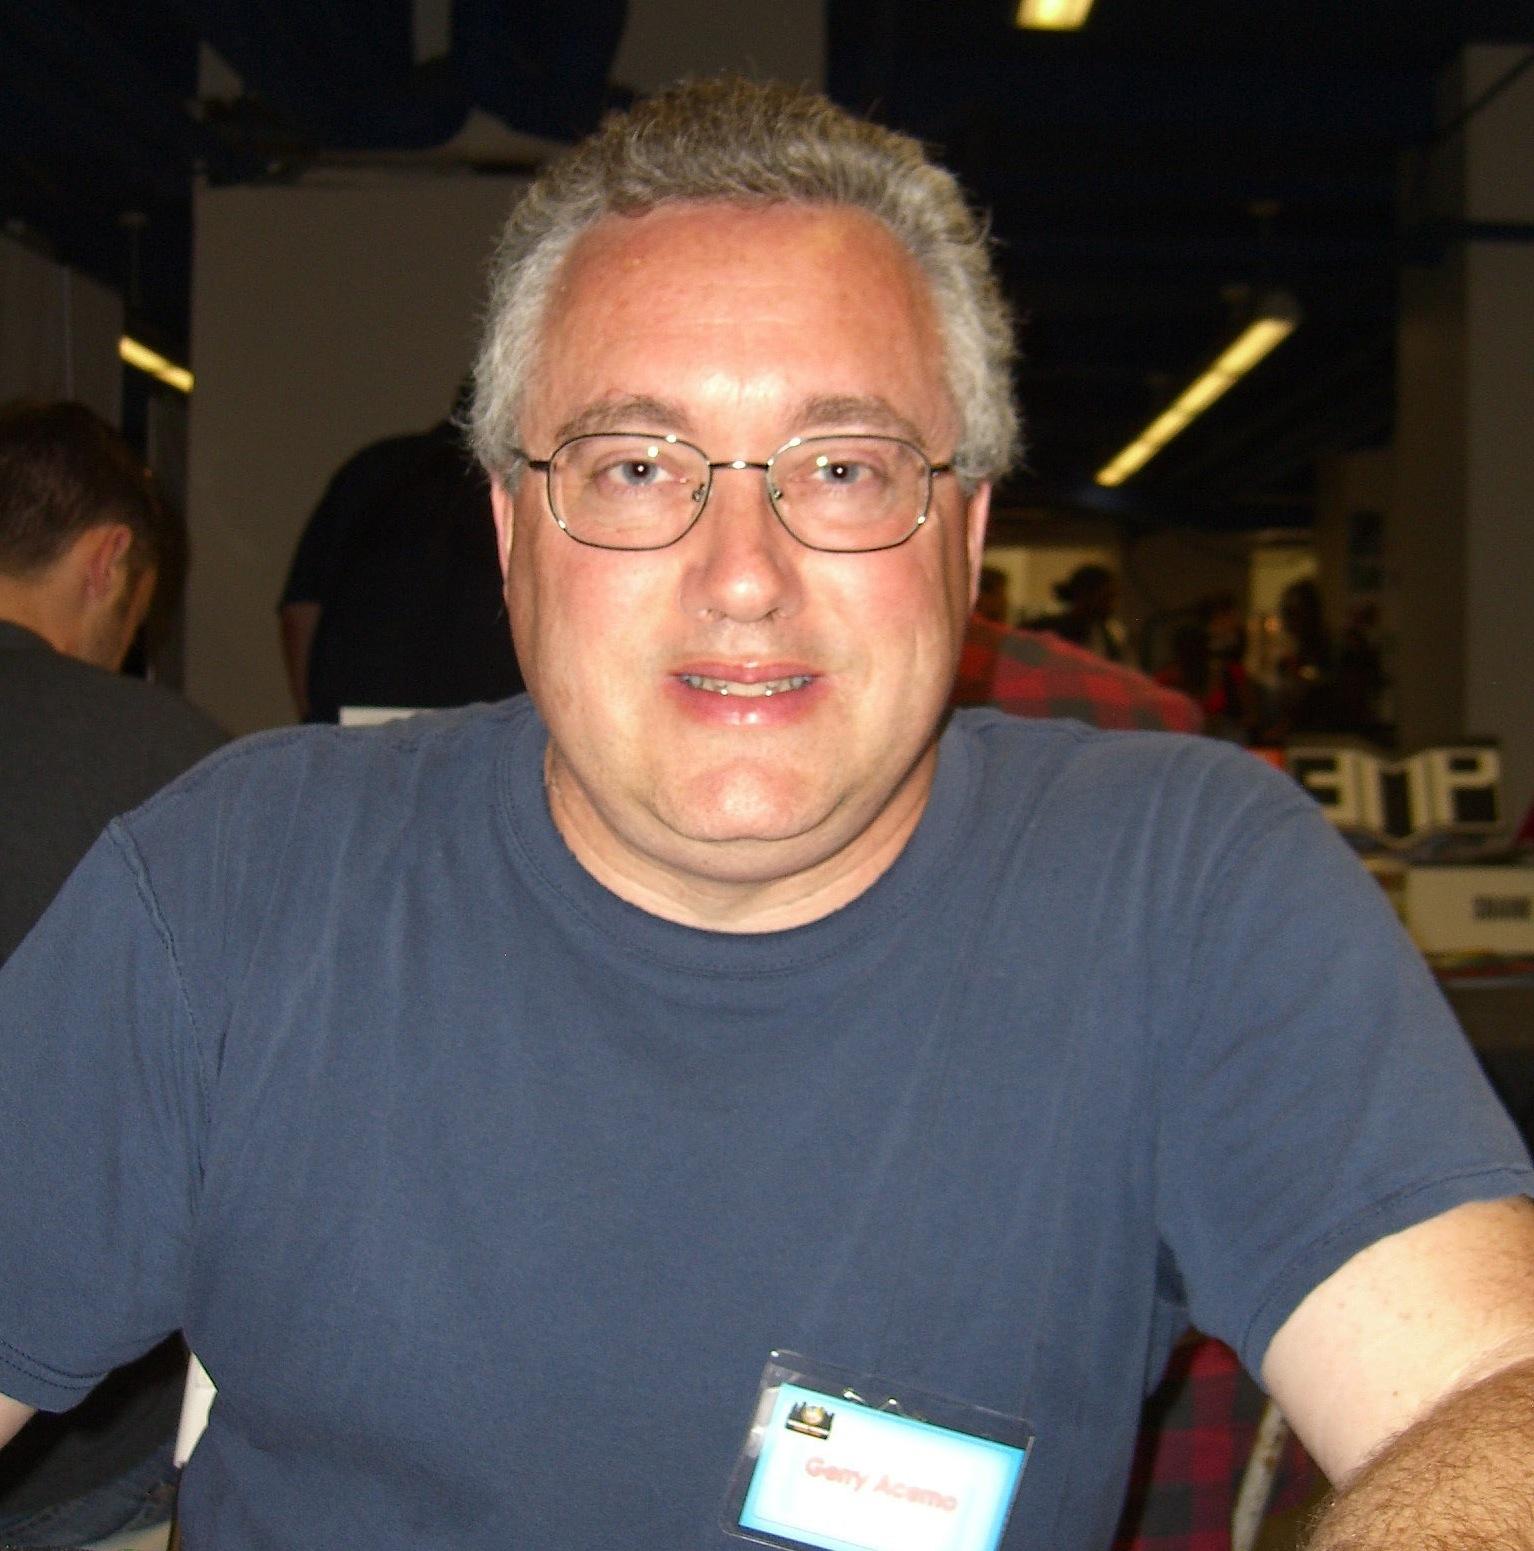 Jerry Acerno